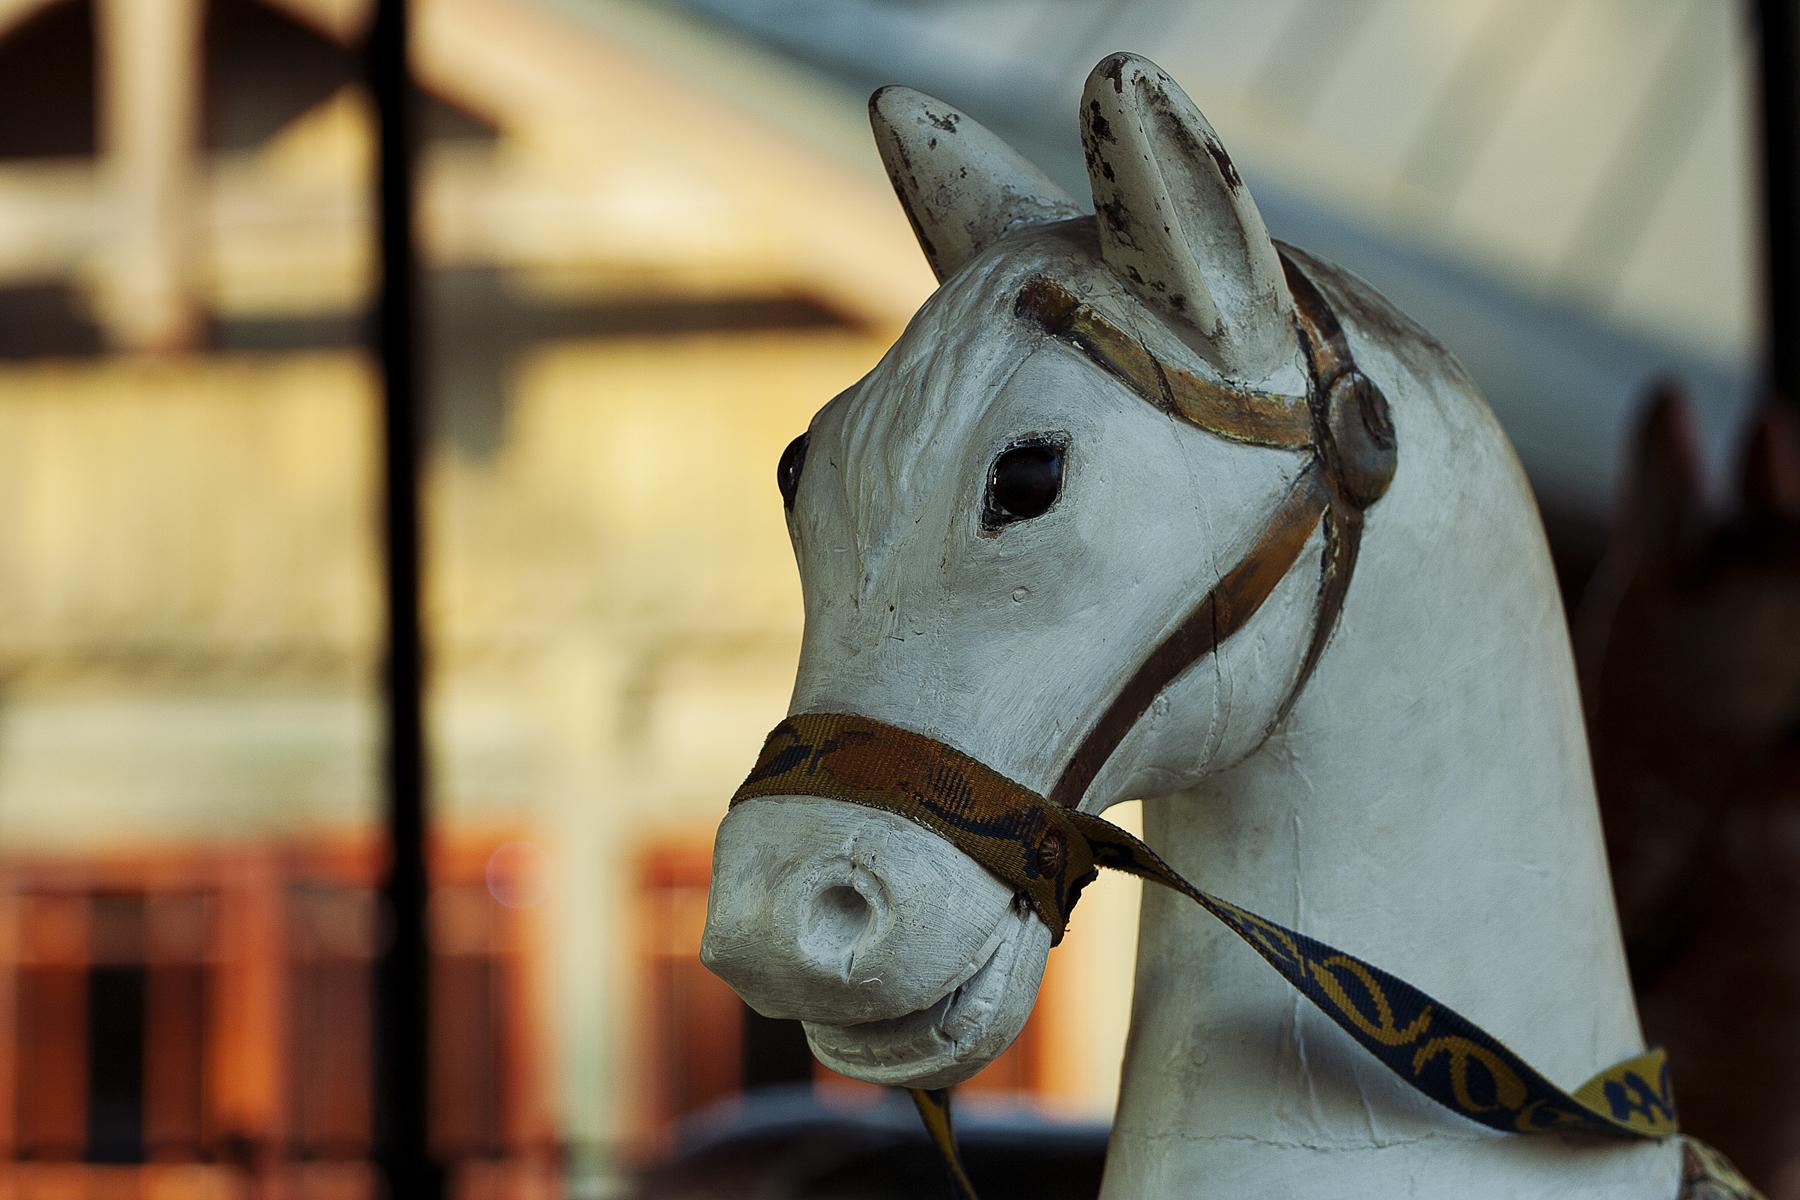 Wooden Horse Via @Atisgailis